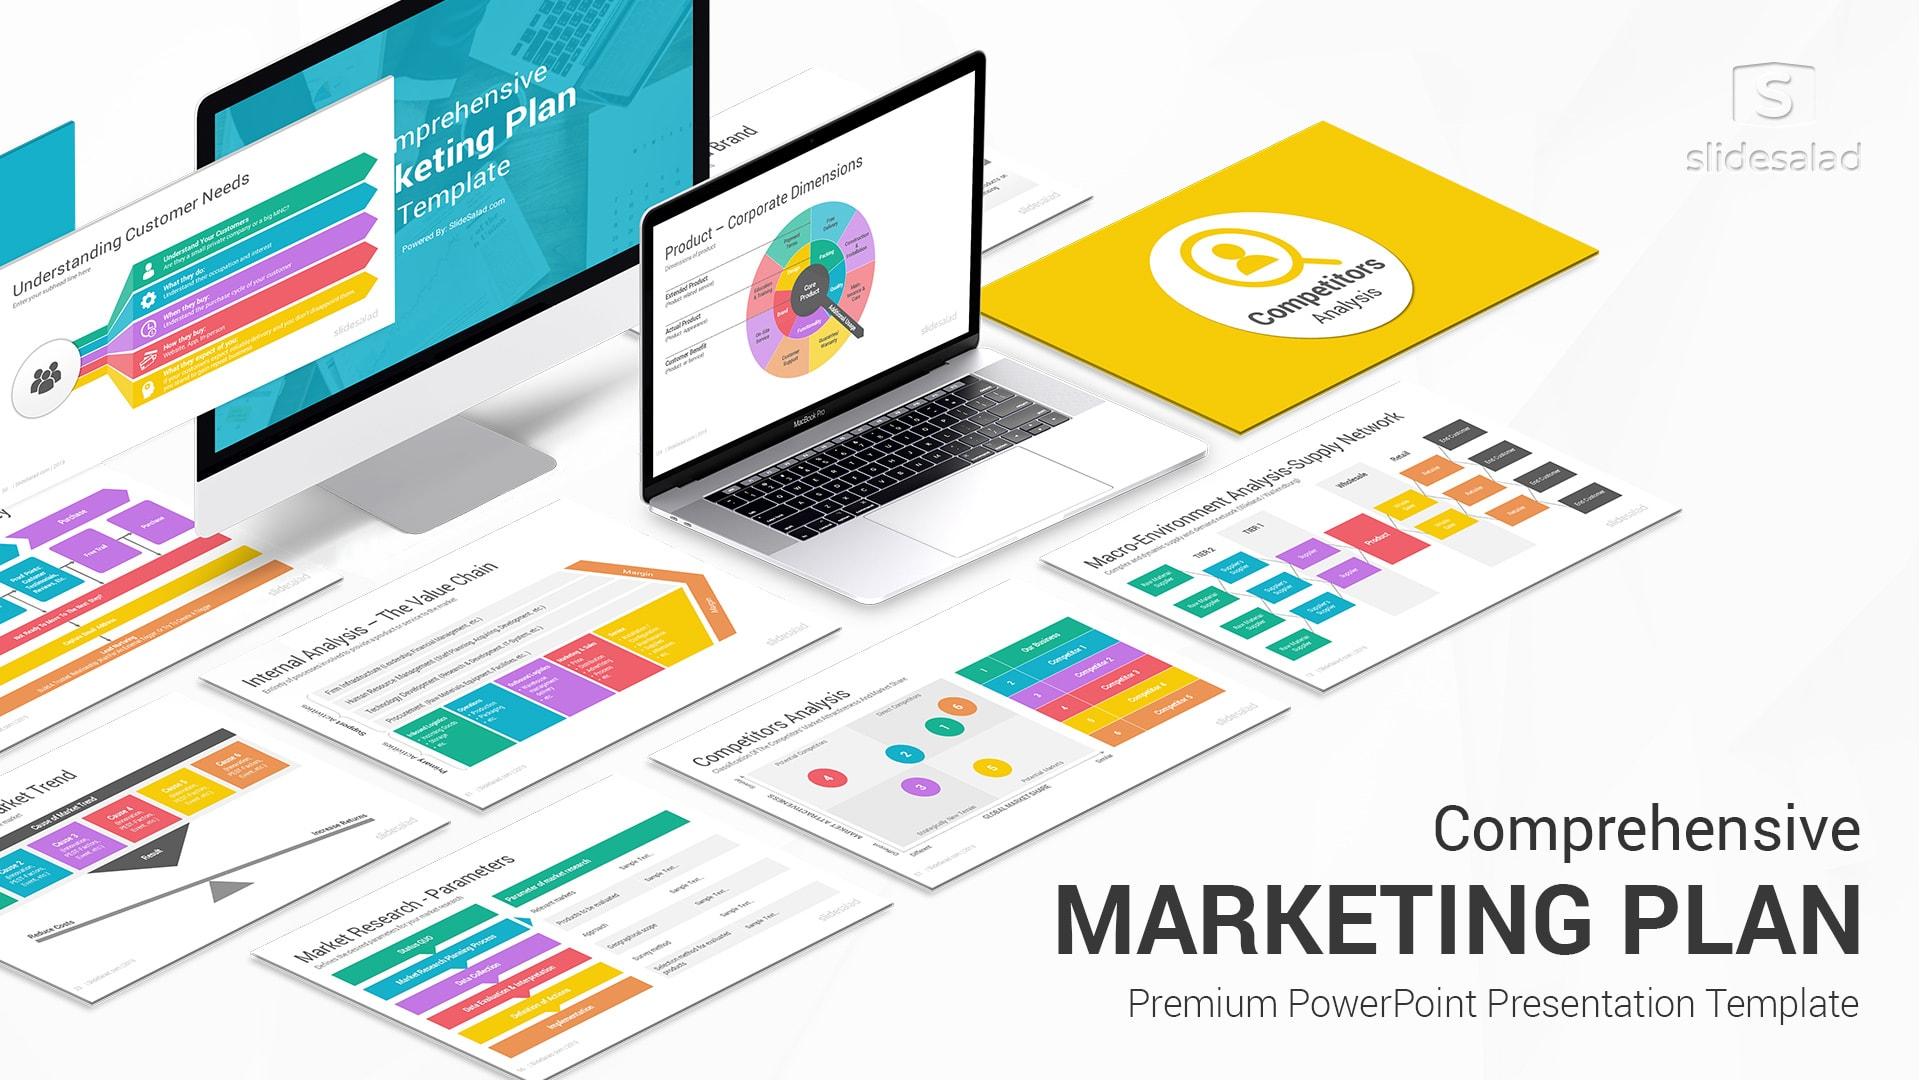 Best Marketing Plan PowerPoint (PPT) Template – PowerPoint PPT Presentation Bundle